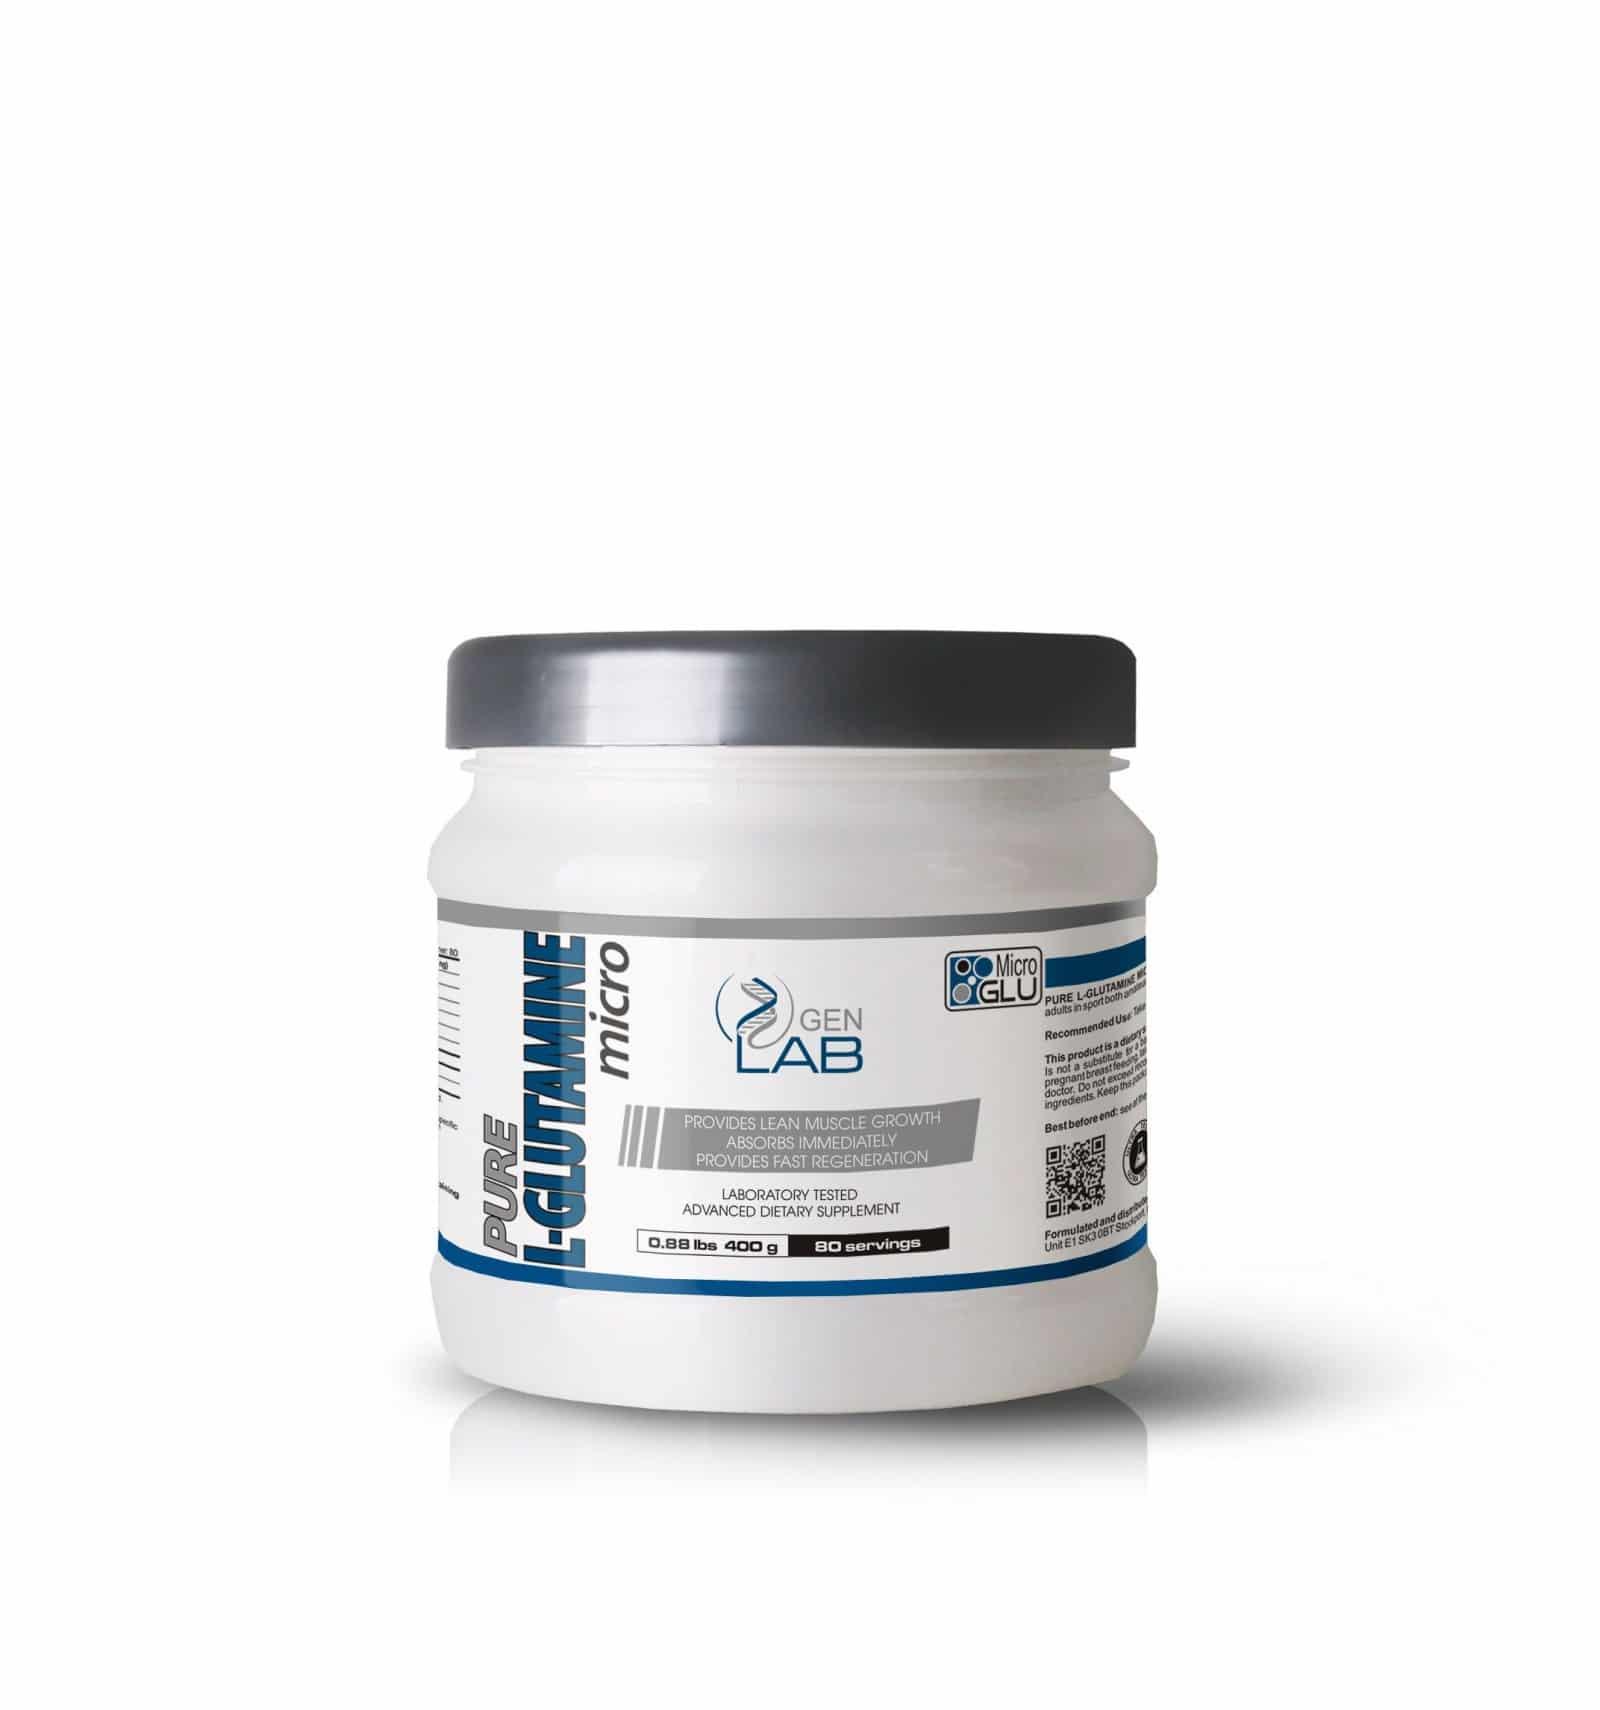 genlab-pure-l-glutamine-vit-c-400-g